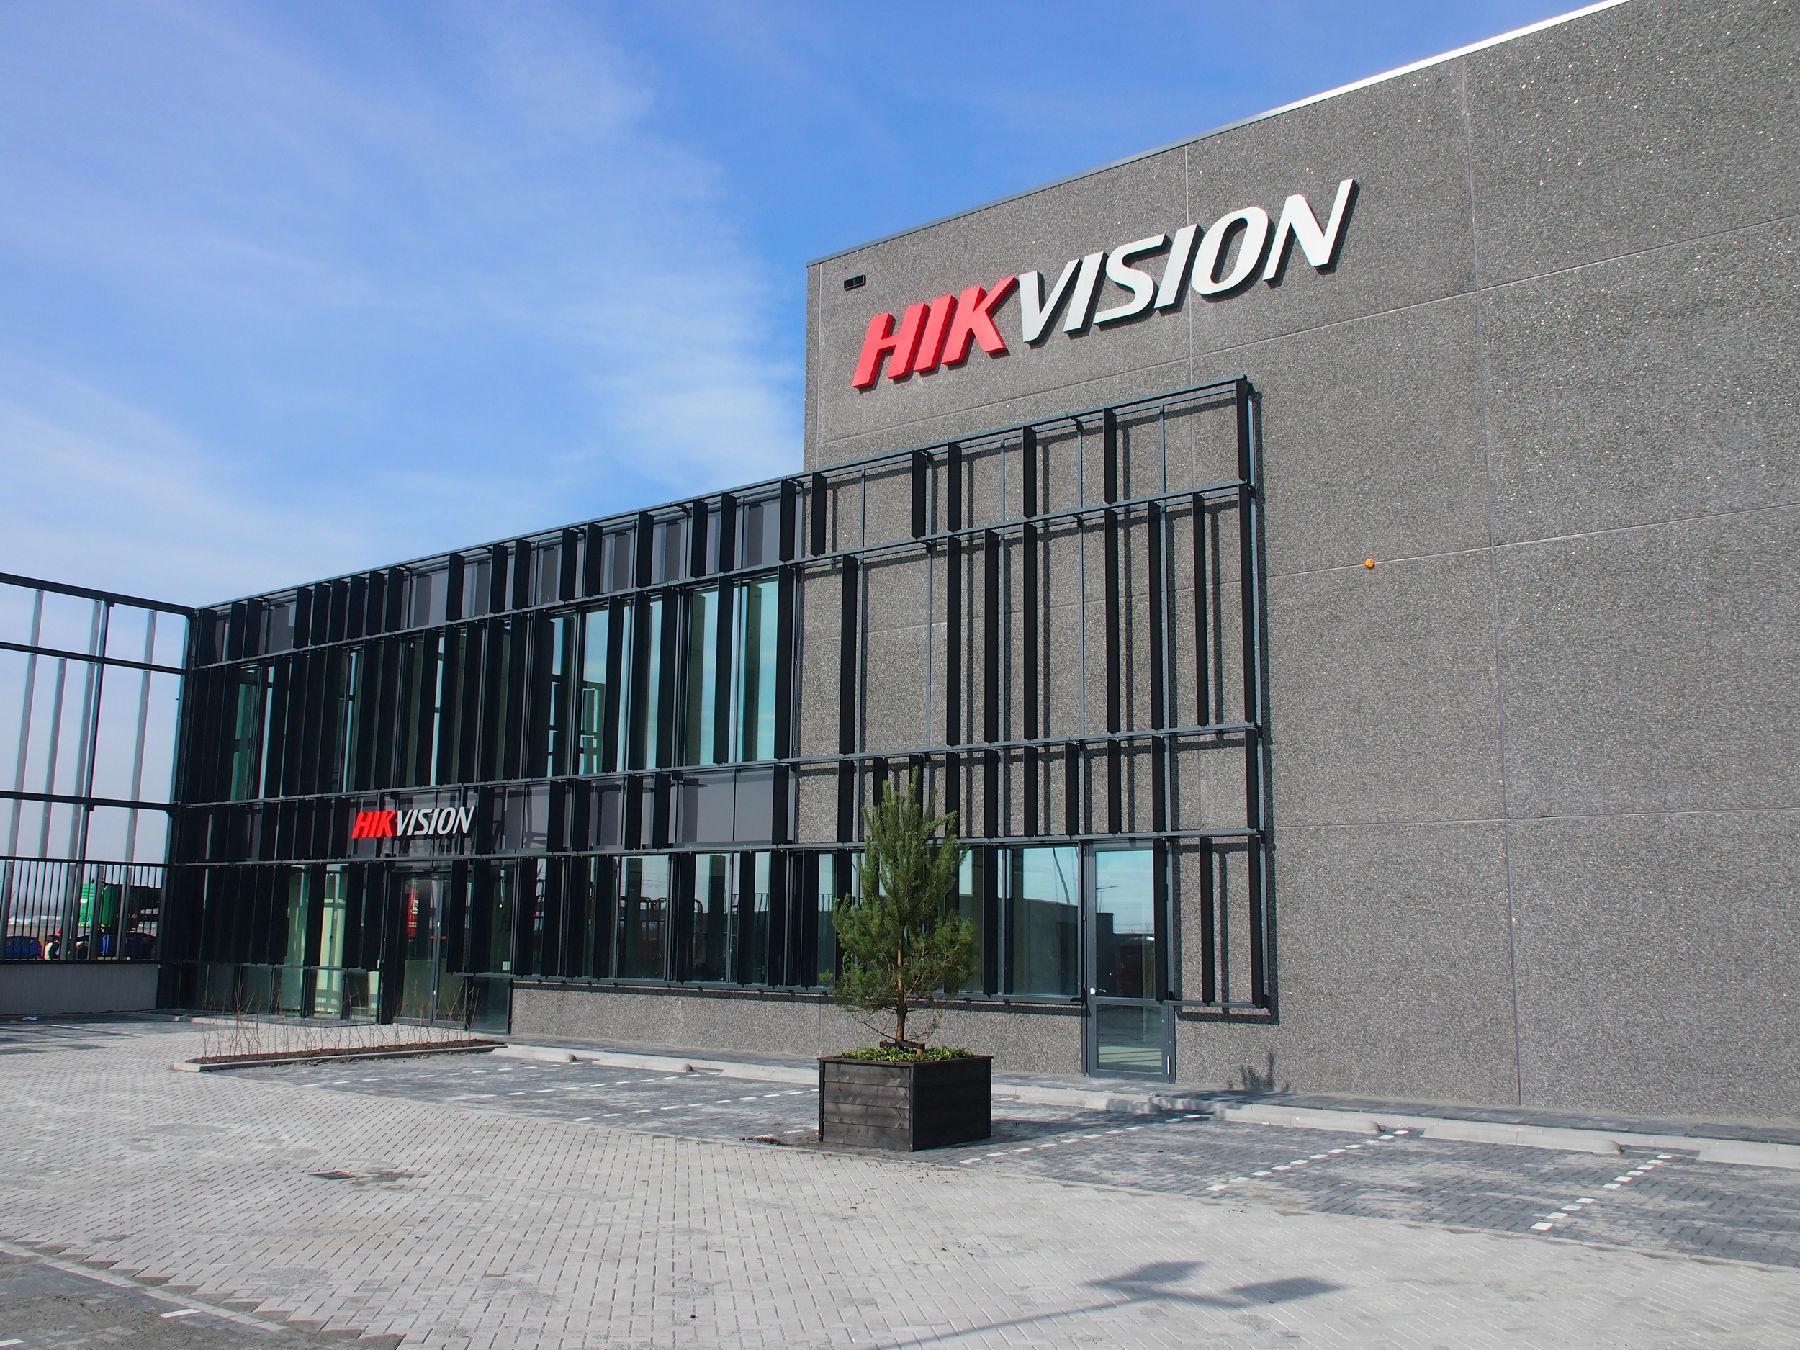 hikvision eu.jpg